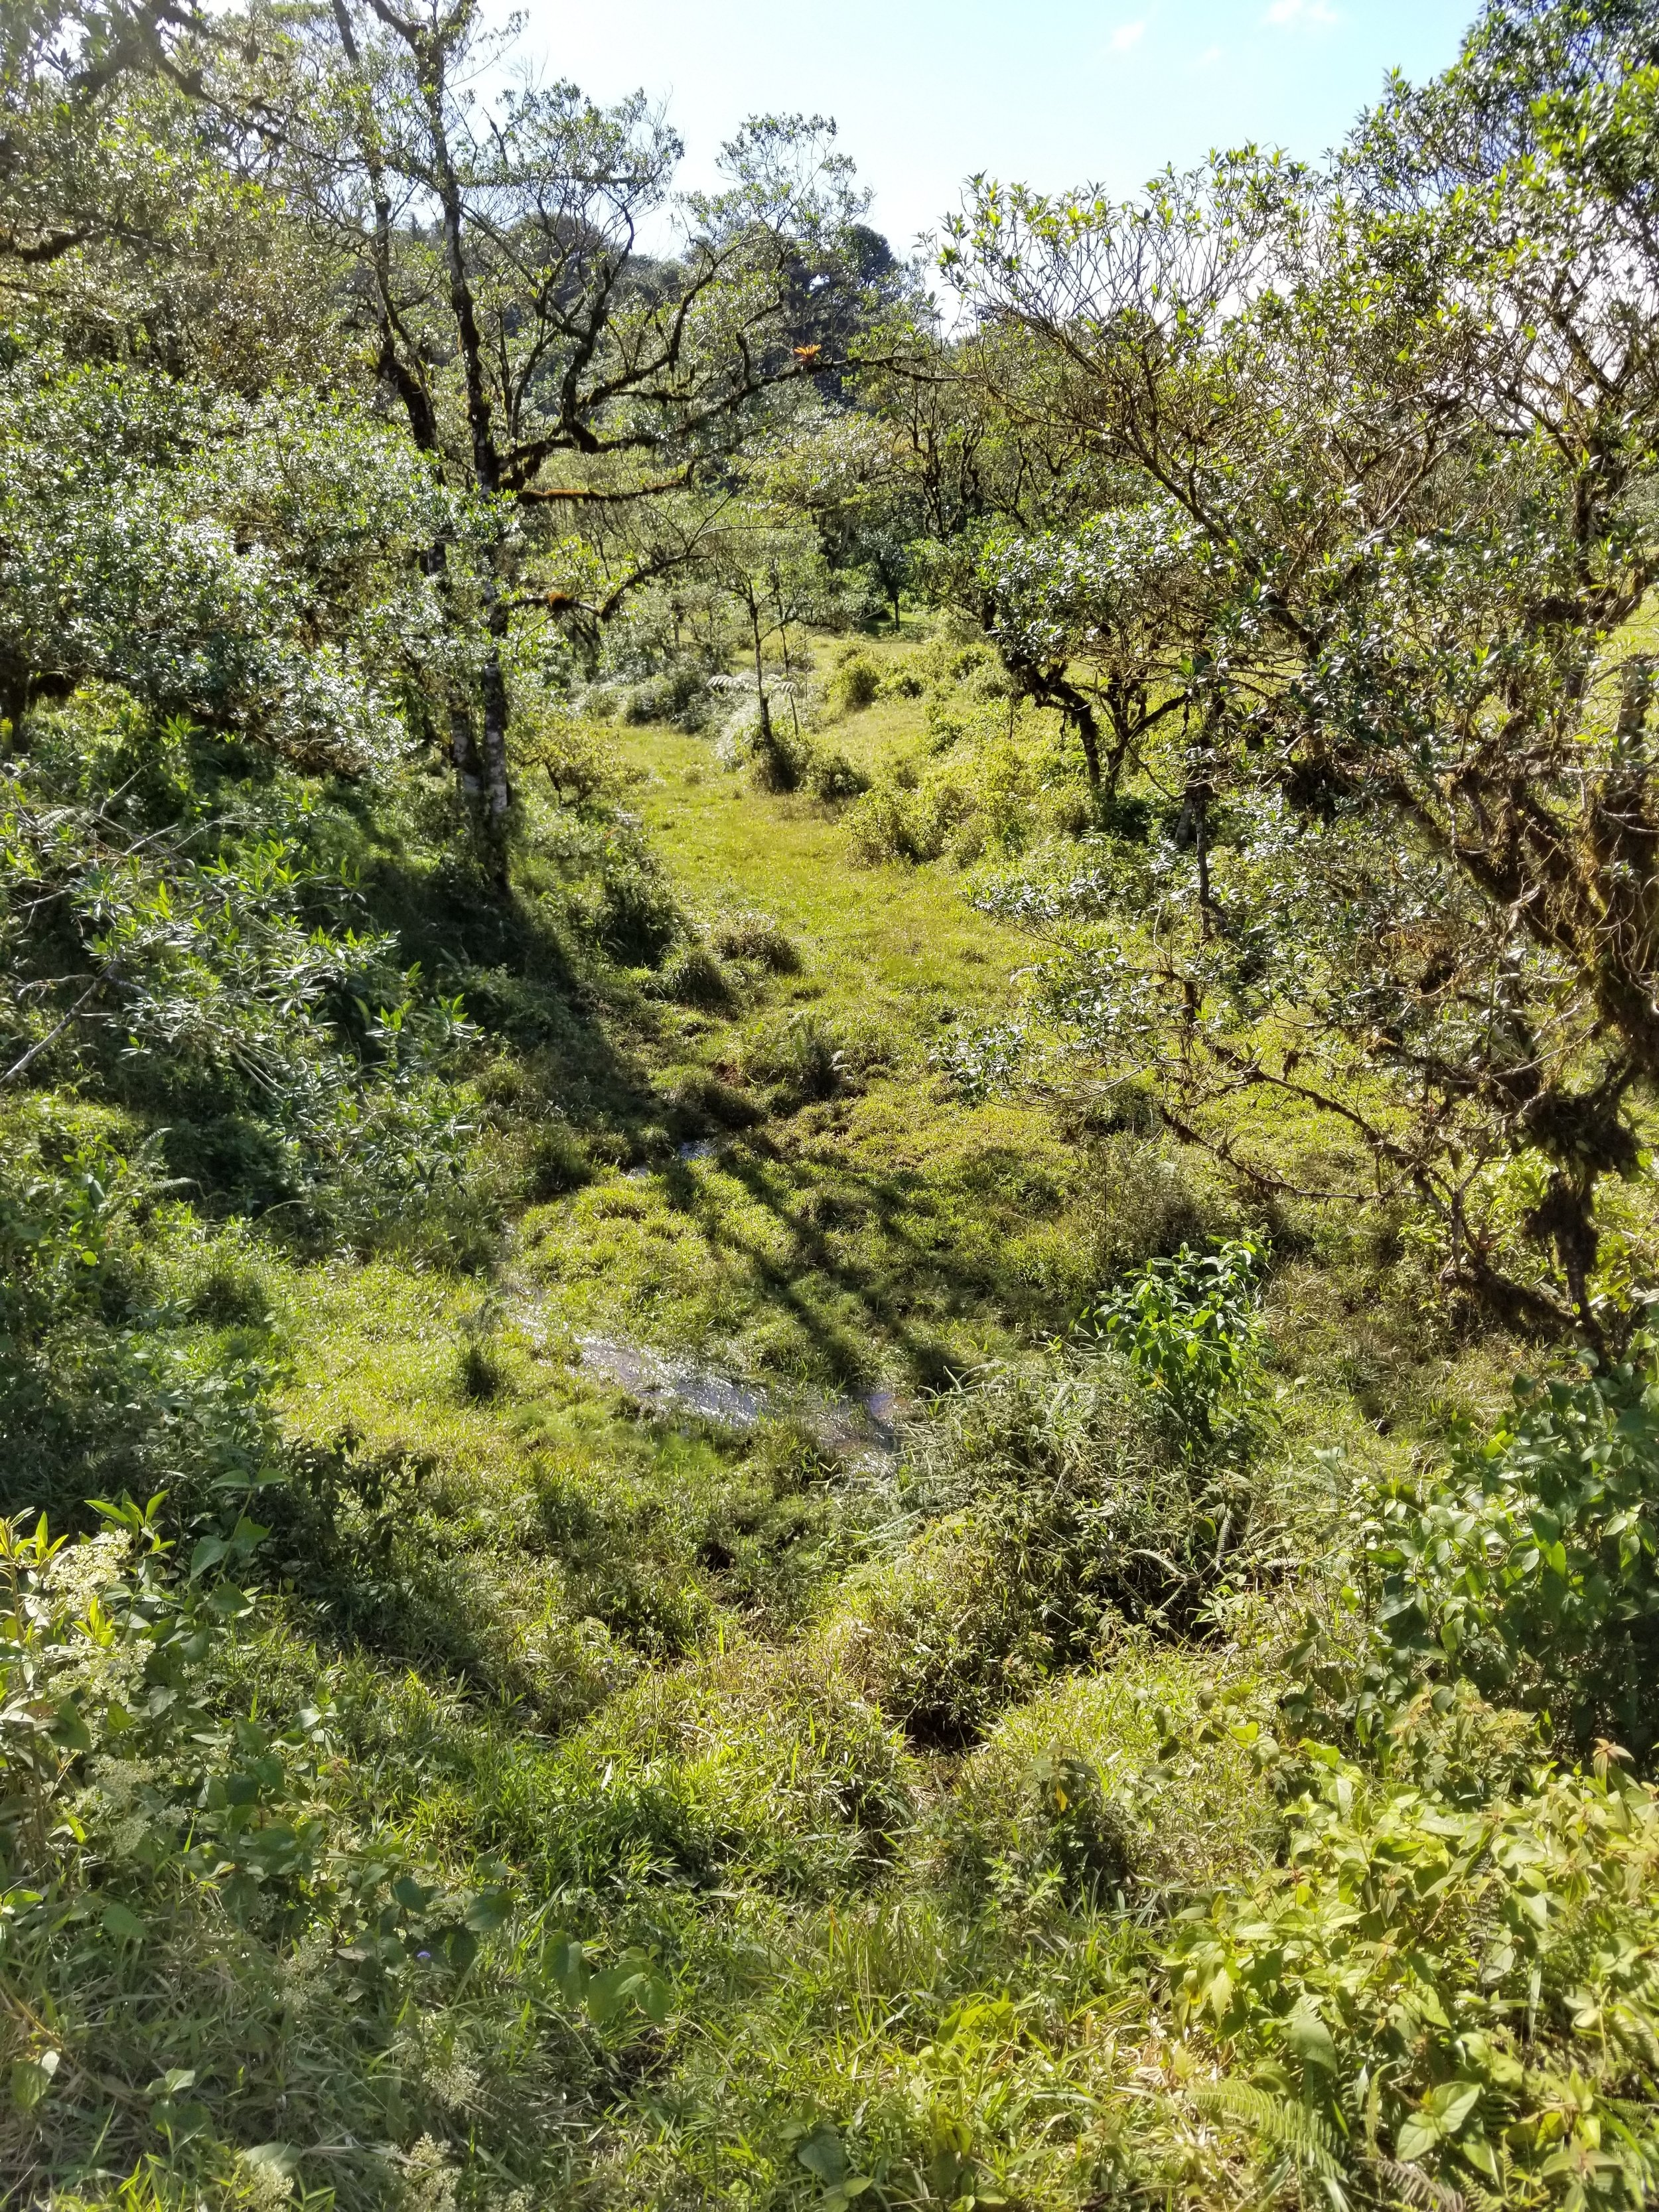 Riparian zone near San Ramon, Costa Rica